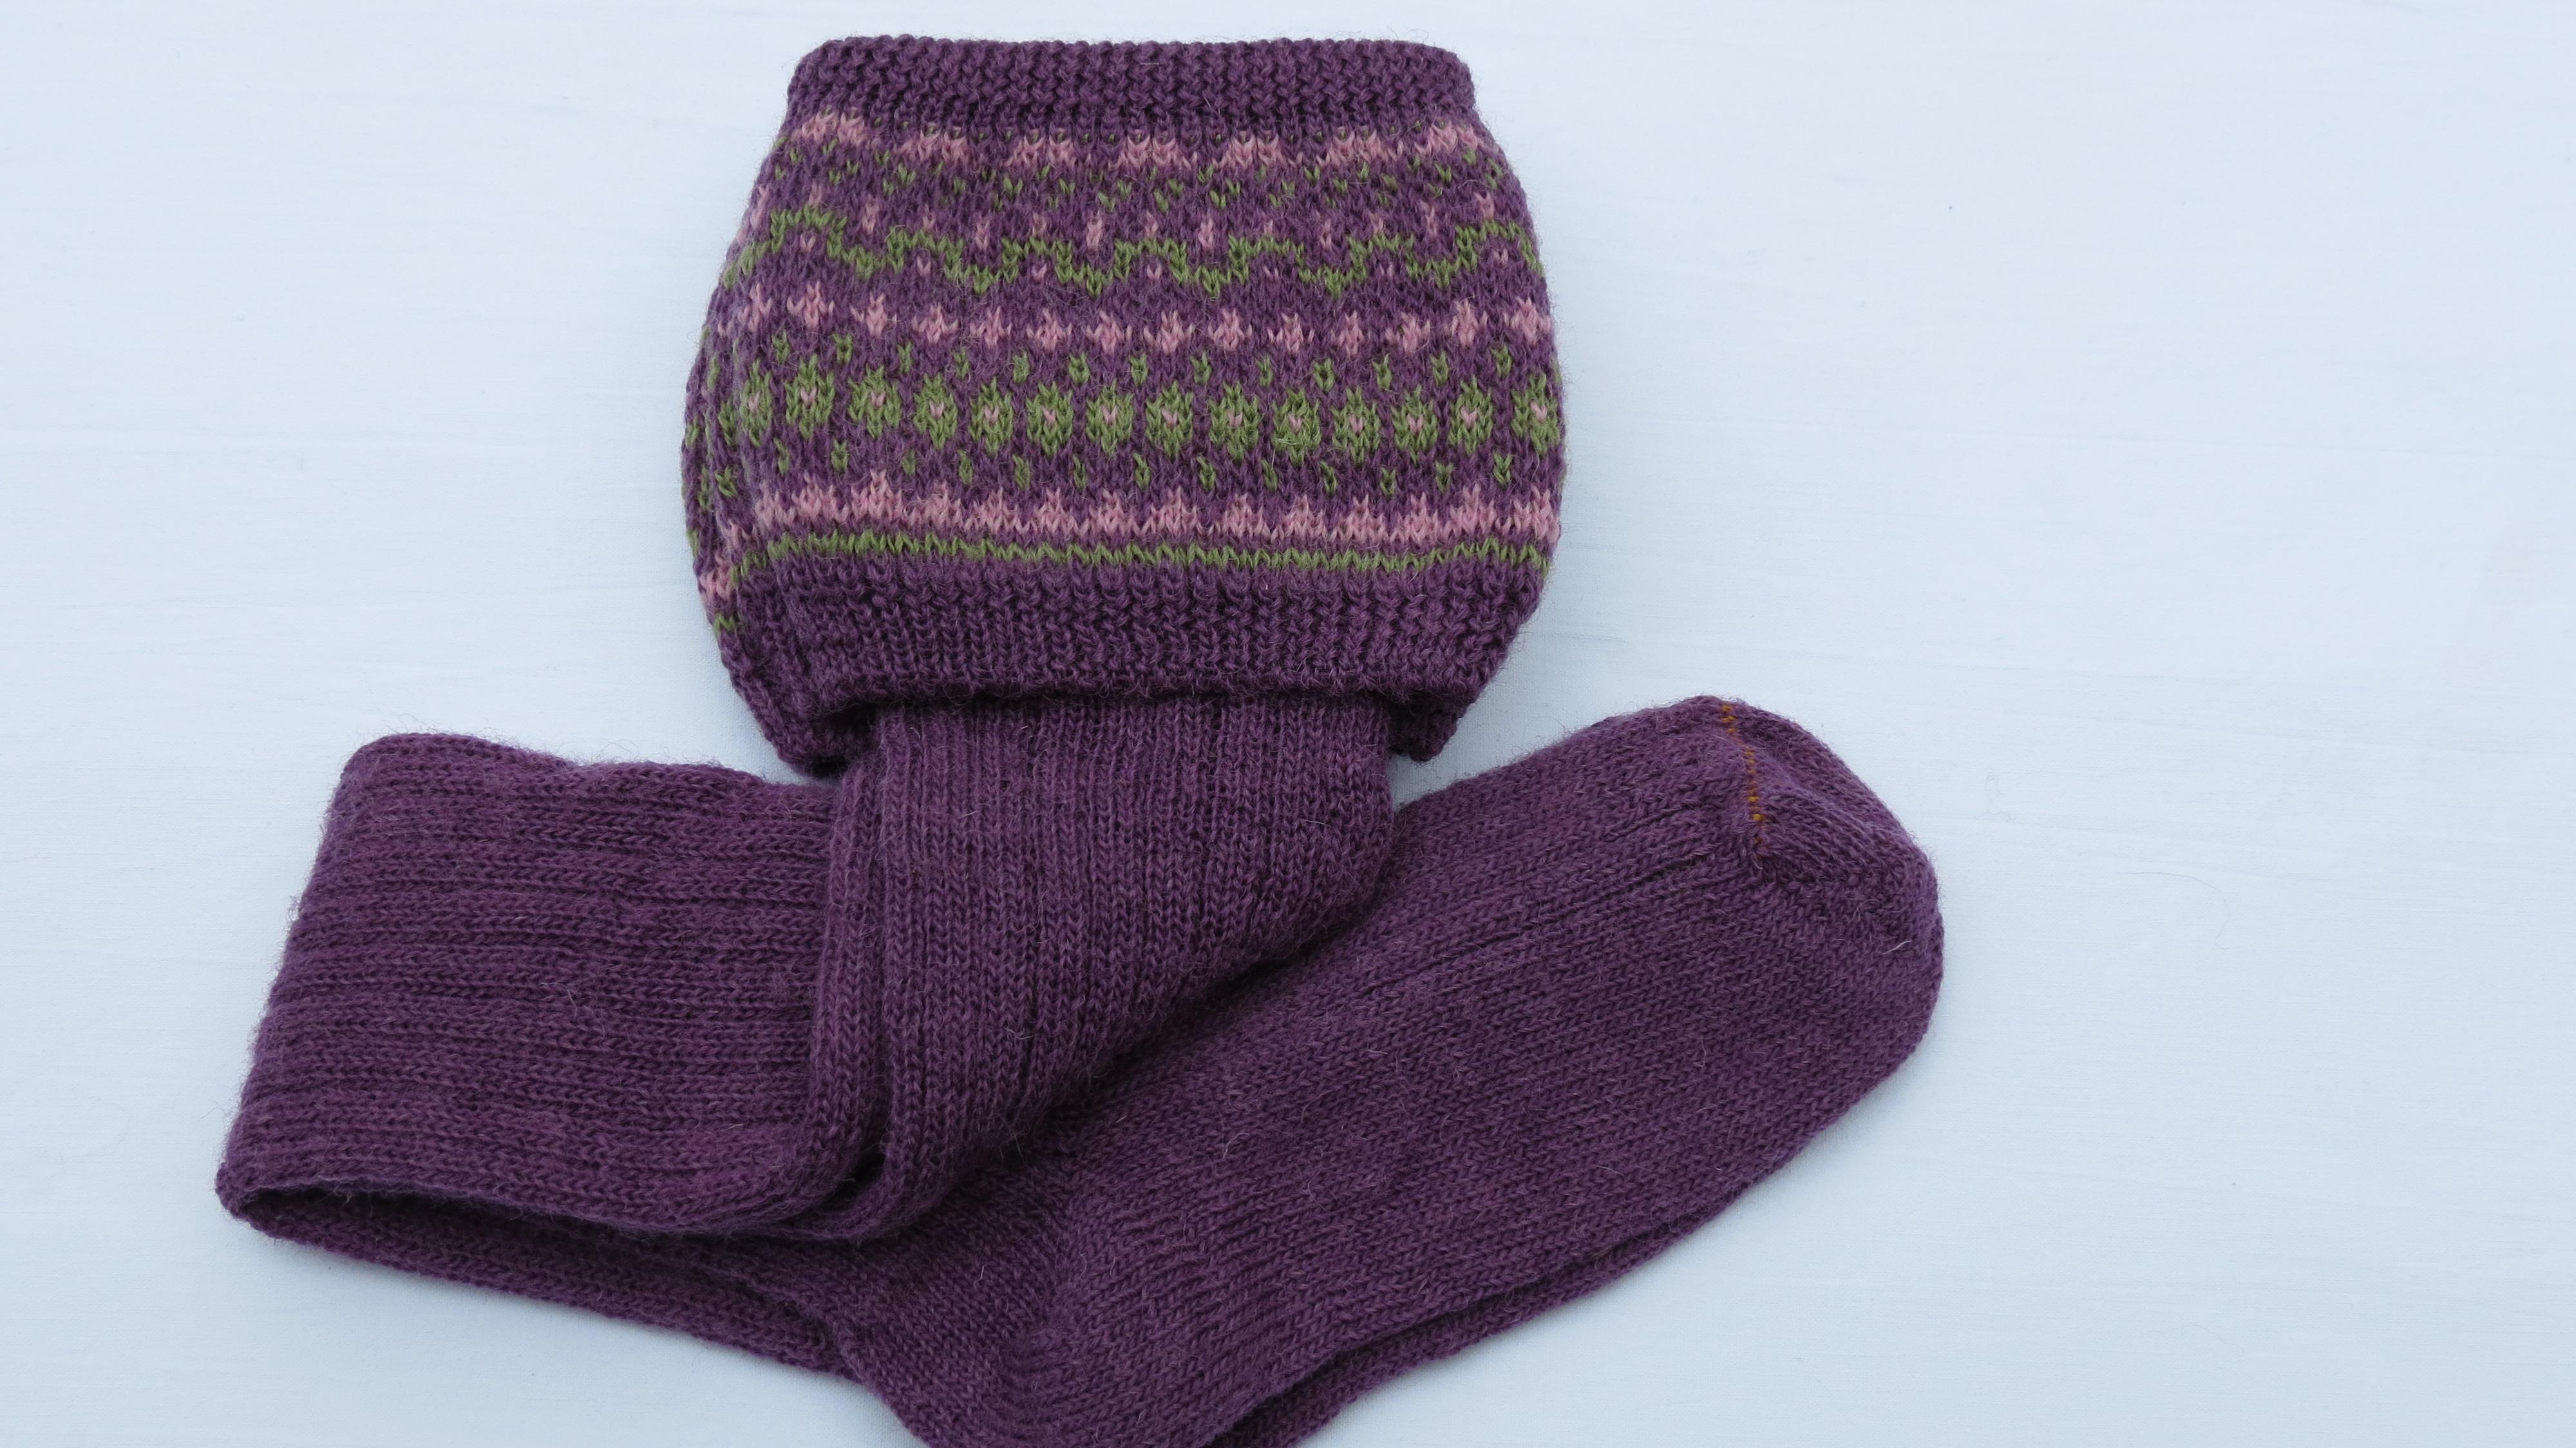 Sock Knitting Kits Uk : Exhibitors 2018 wool @ junction 13